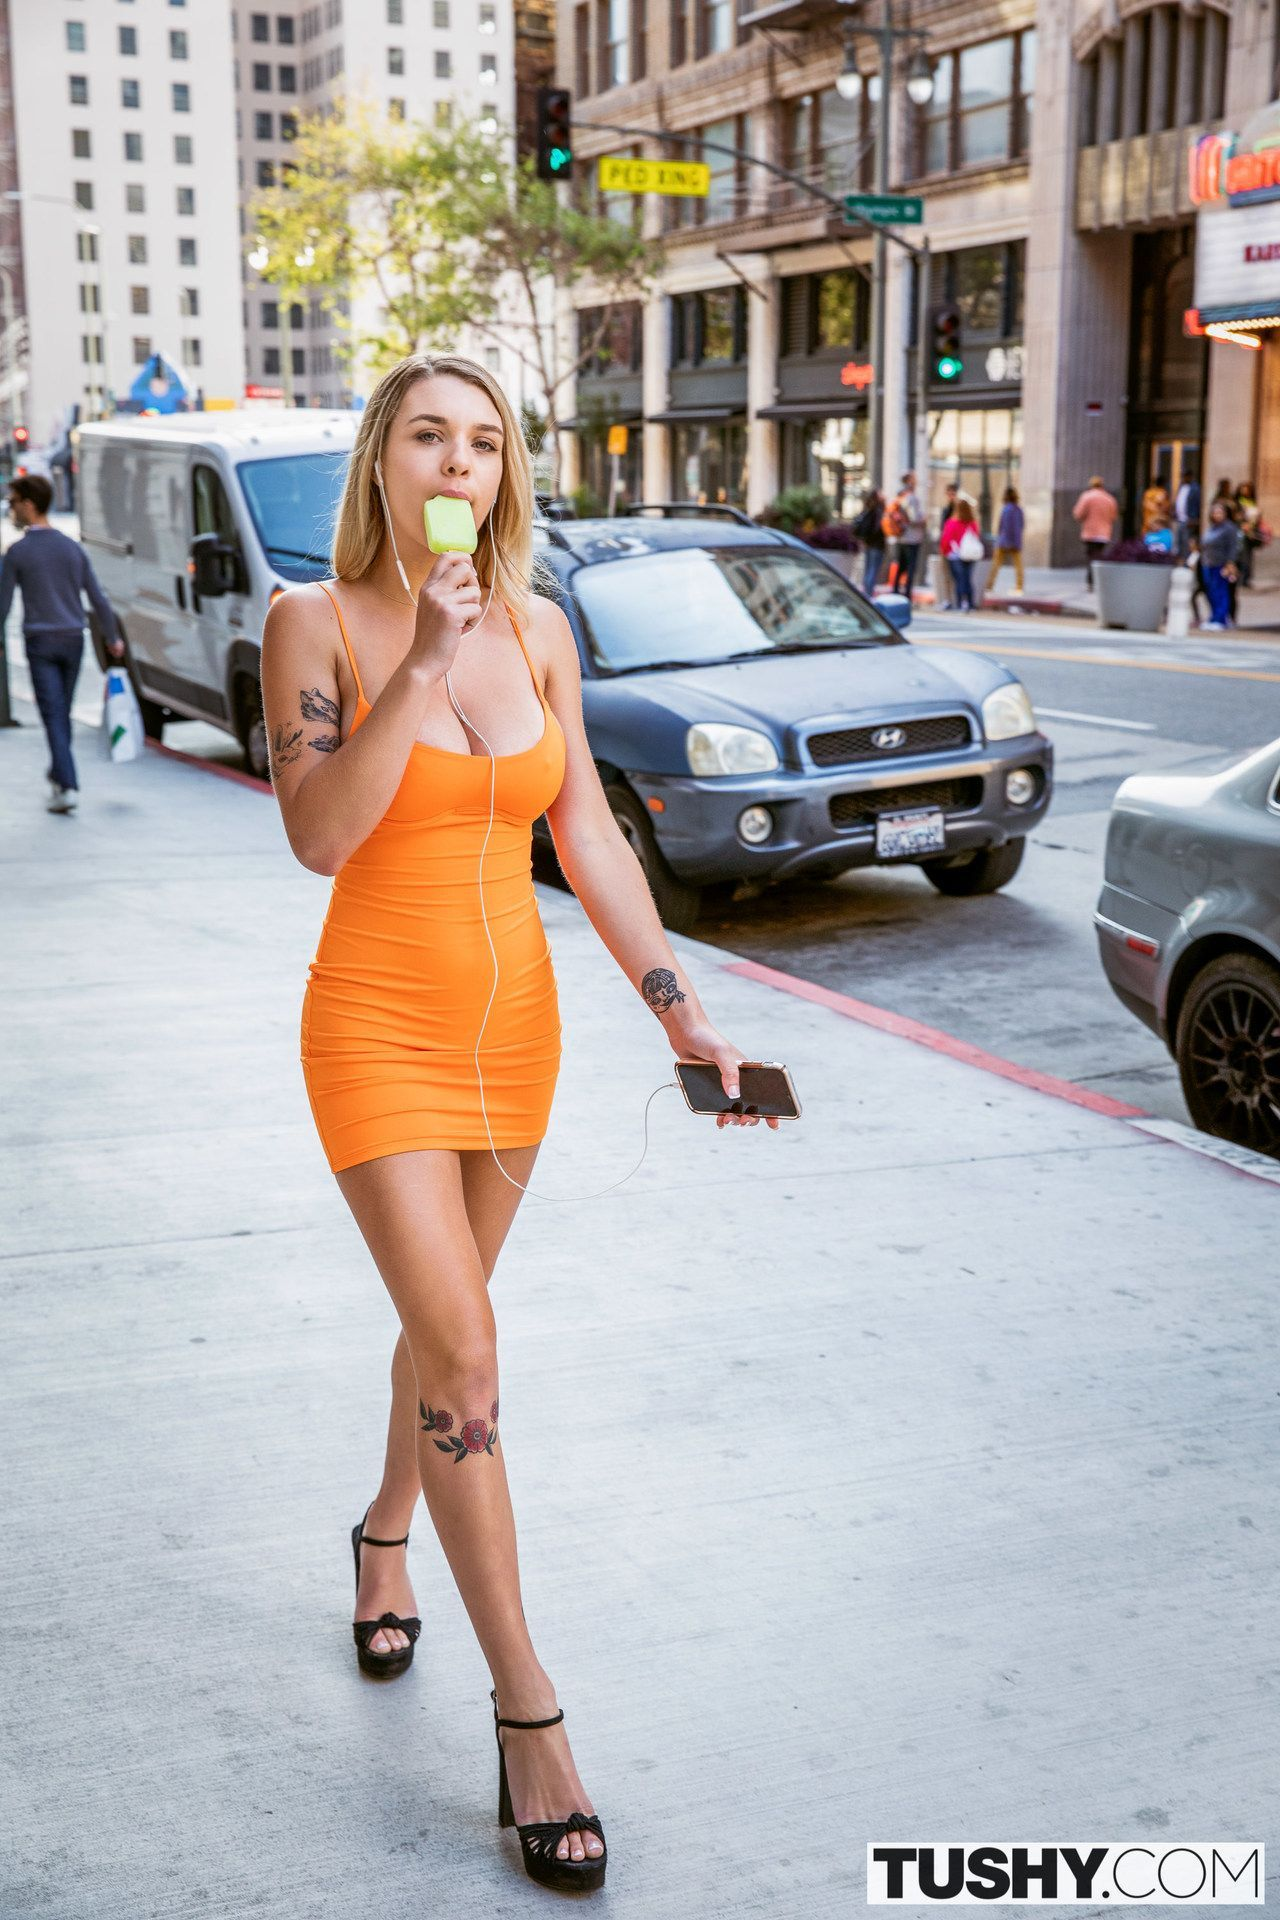 Gabbie Carter Pictures. Hotness Rating = 9.23/10